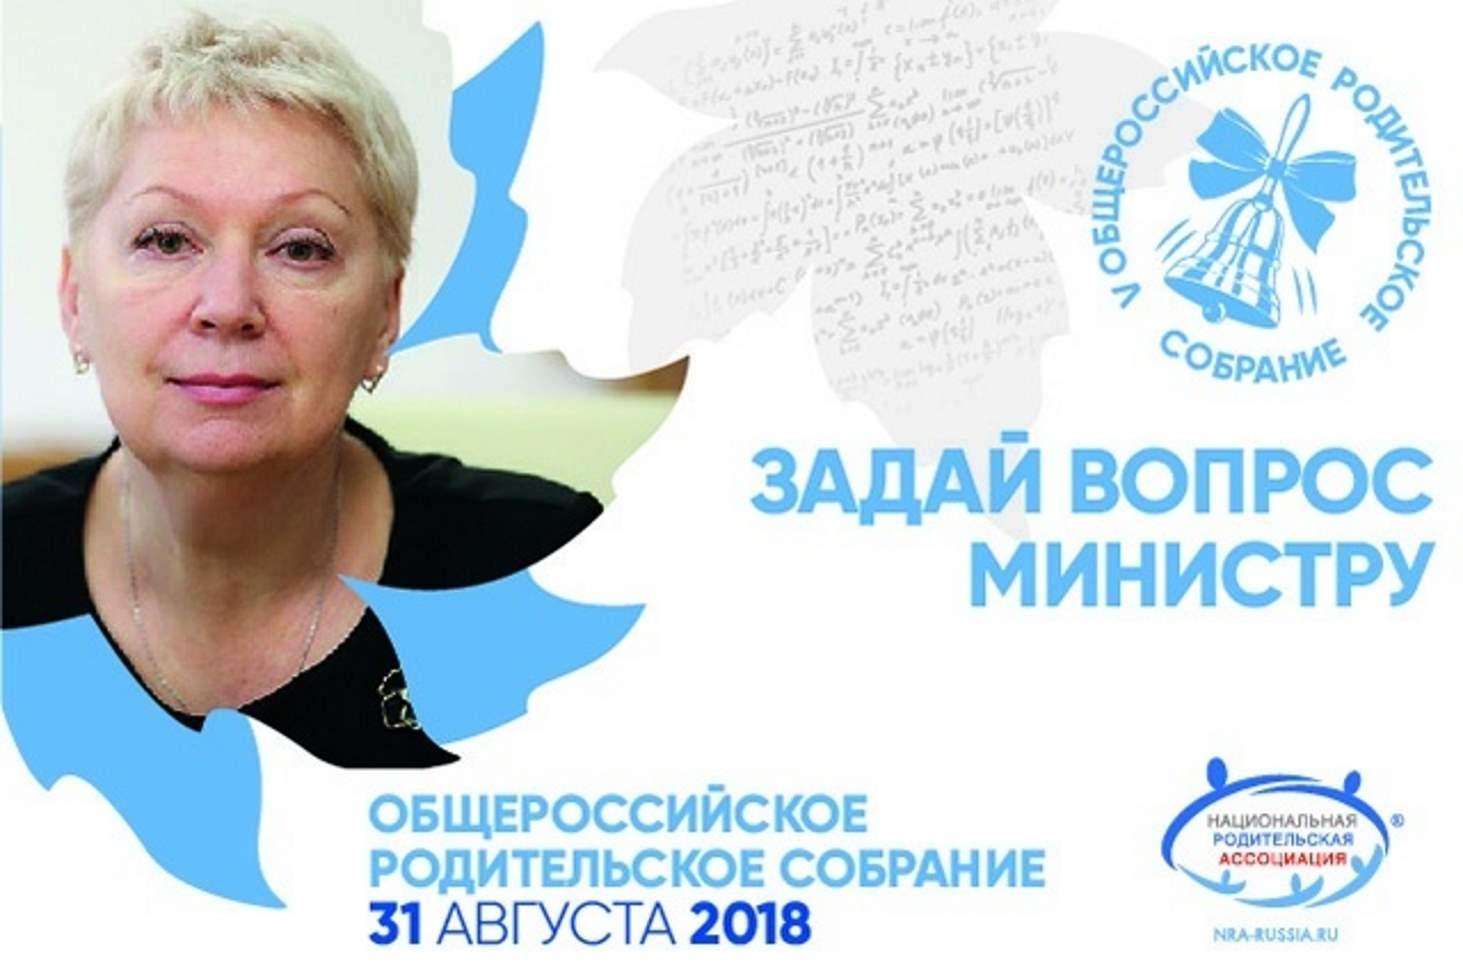 31-avgusta-projdet-obshherossijskoe-roditelskoe-sobranie